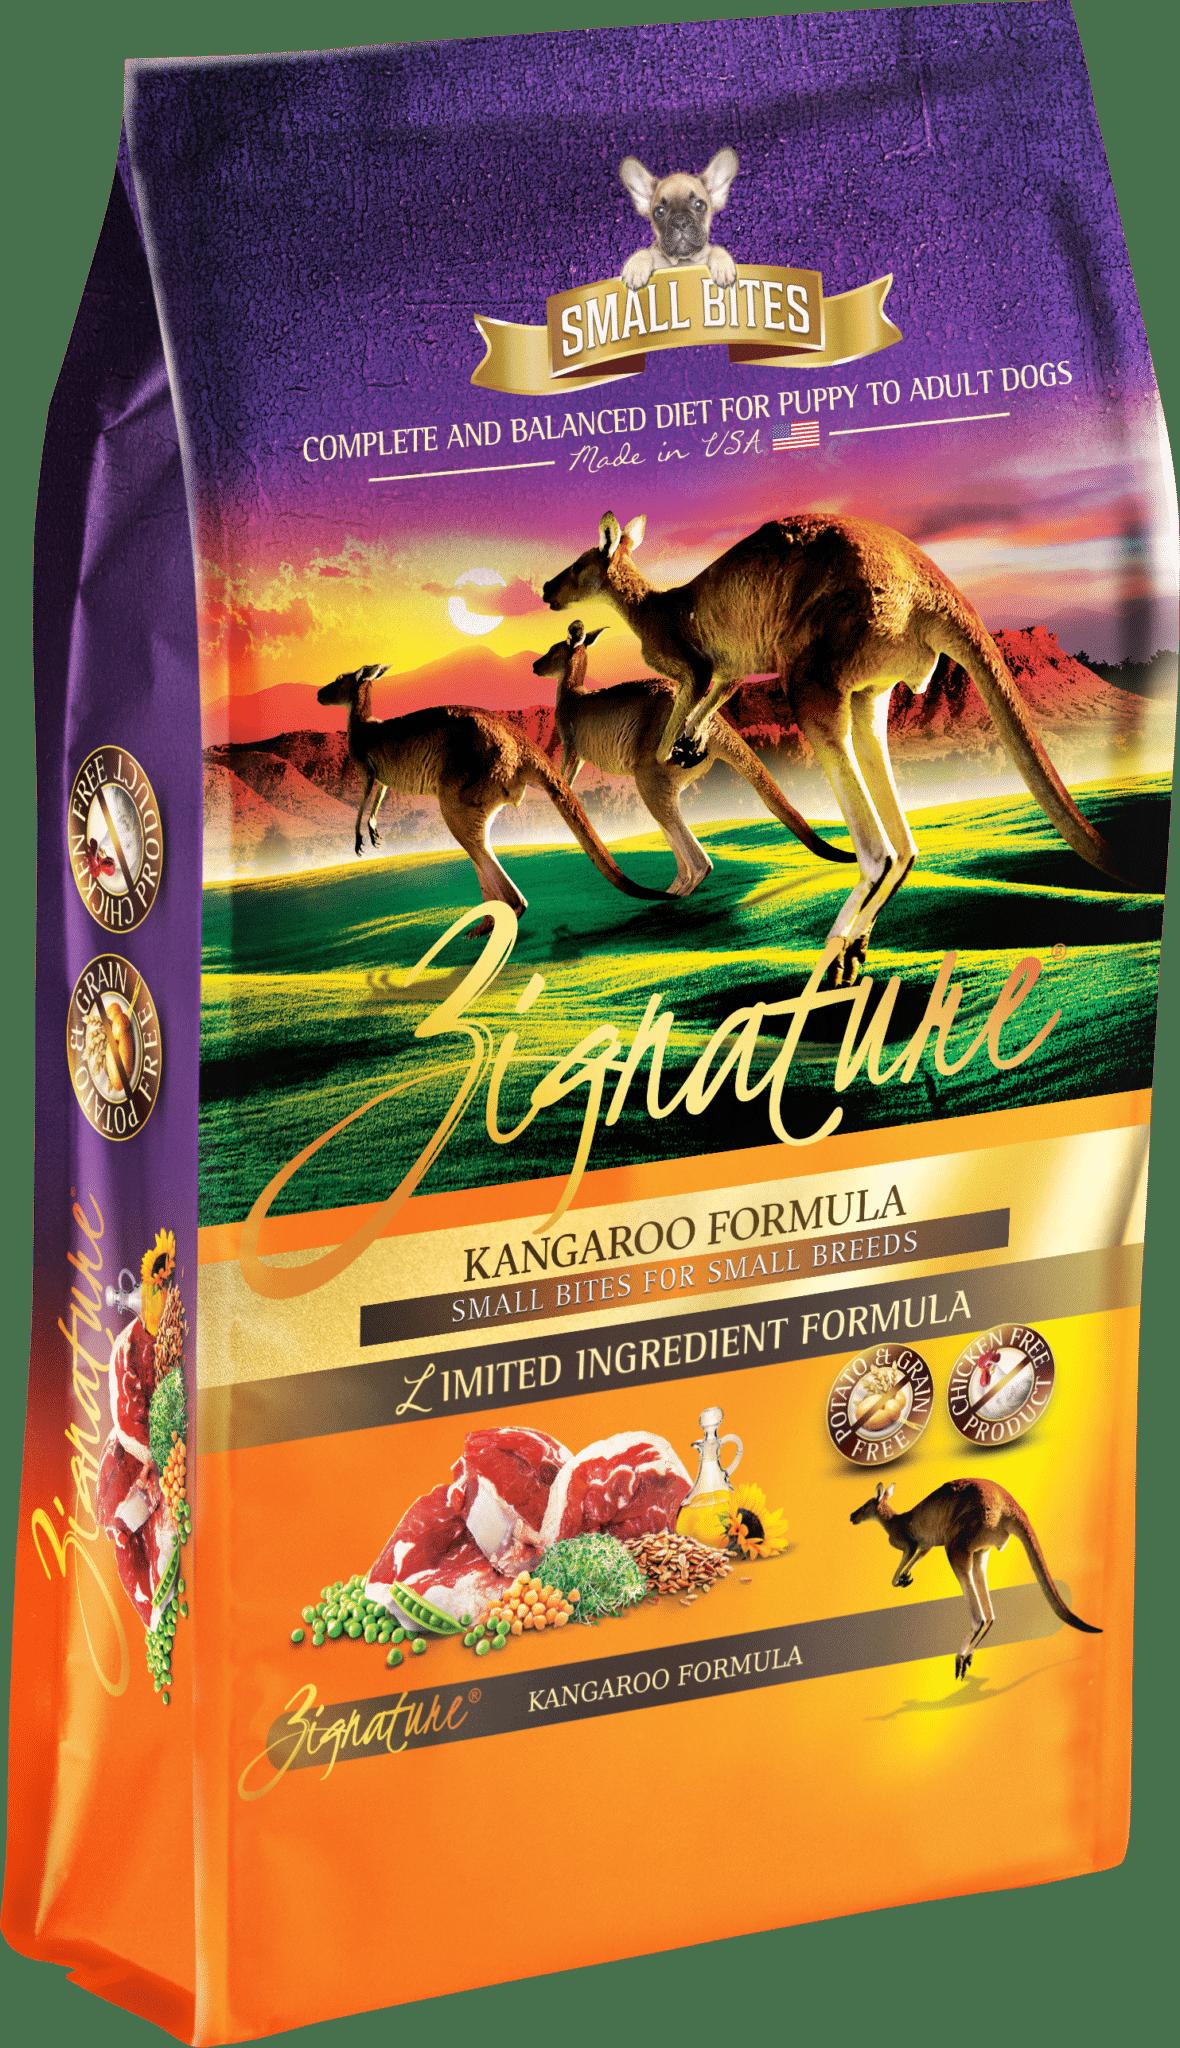 Zignature Zignature Kangaroo Small Bites Limited Ingredient Formula Dog Food 13.5lbs Product Image